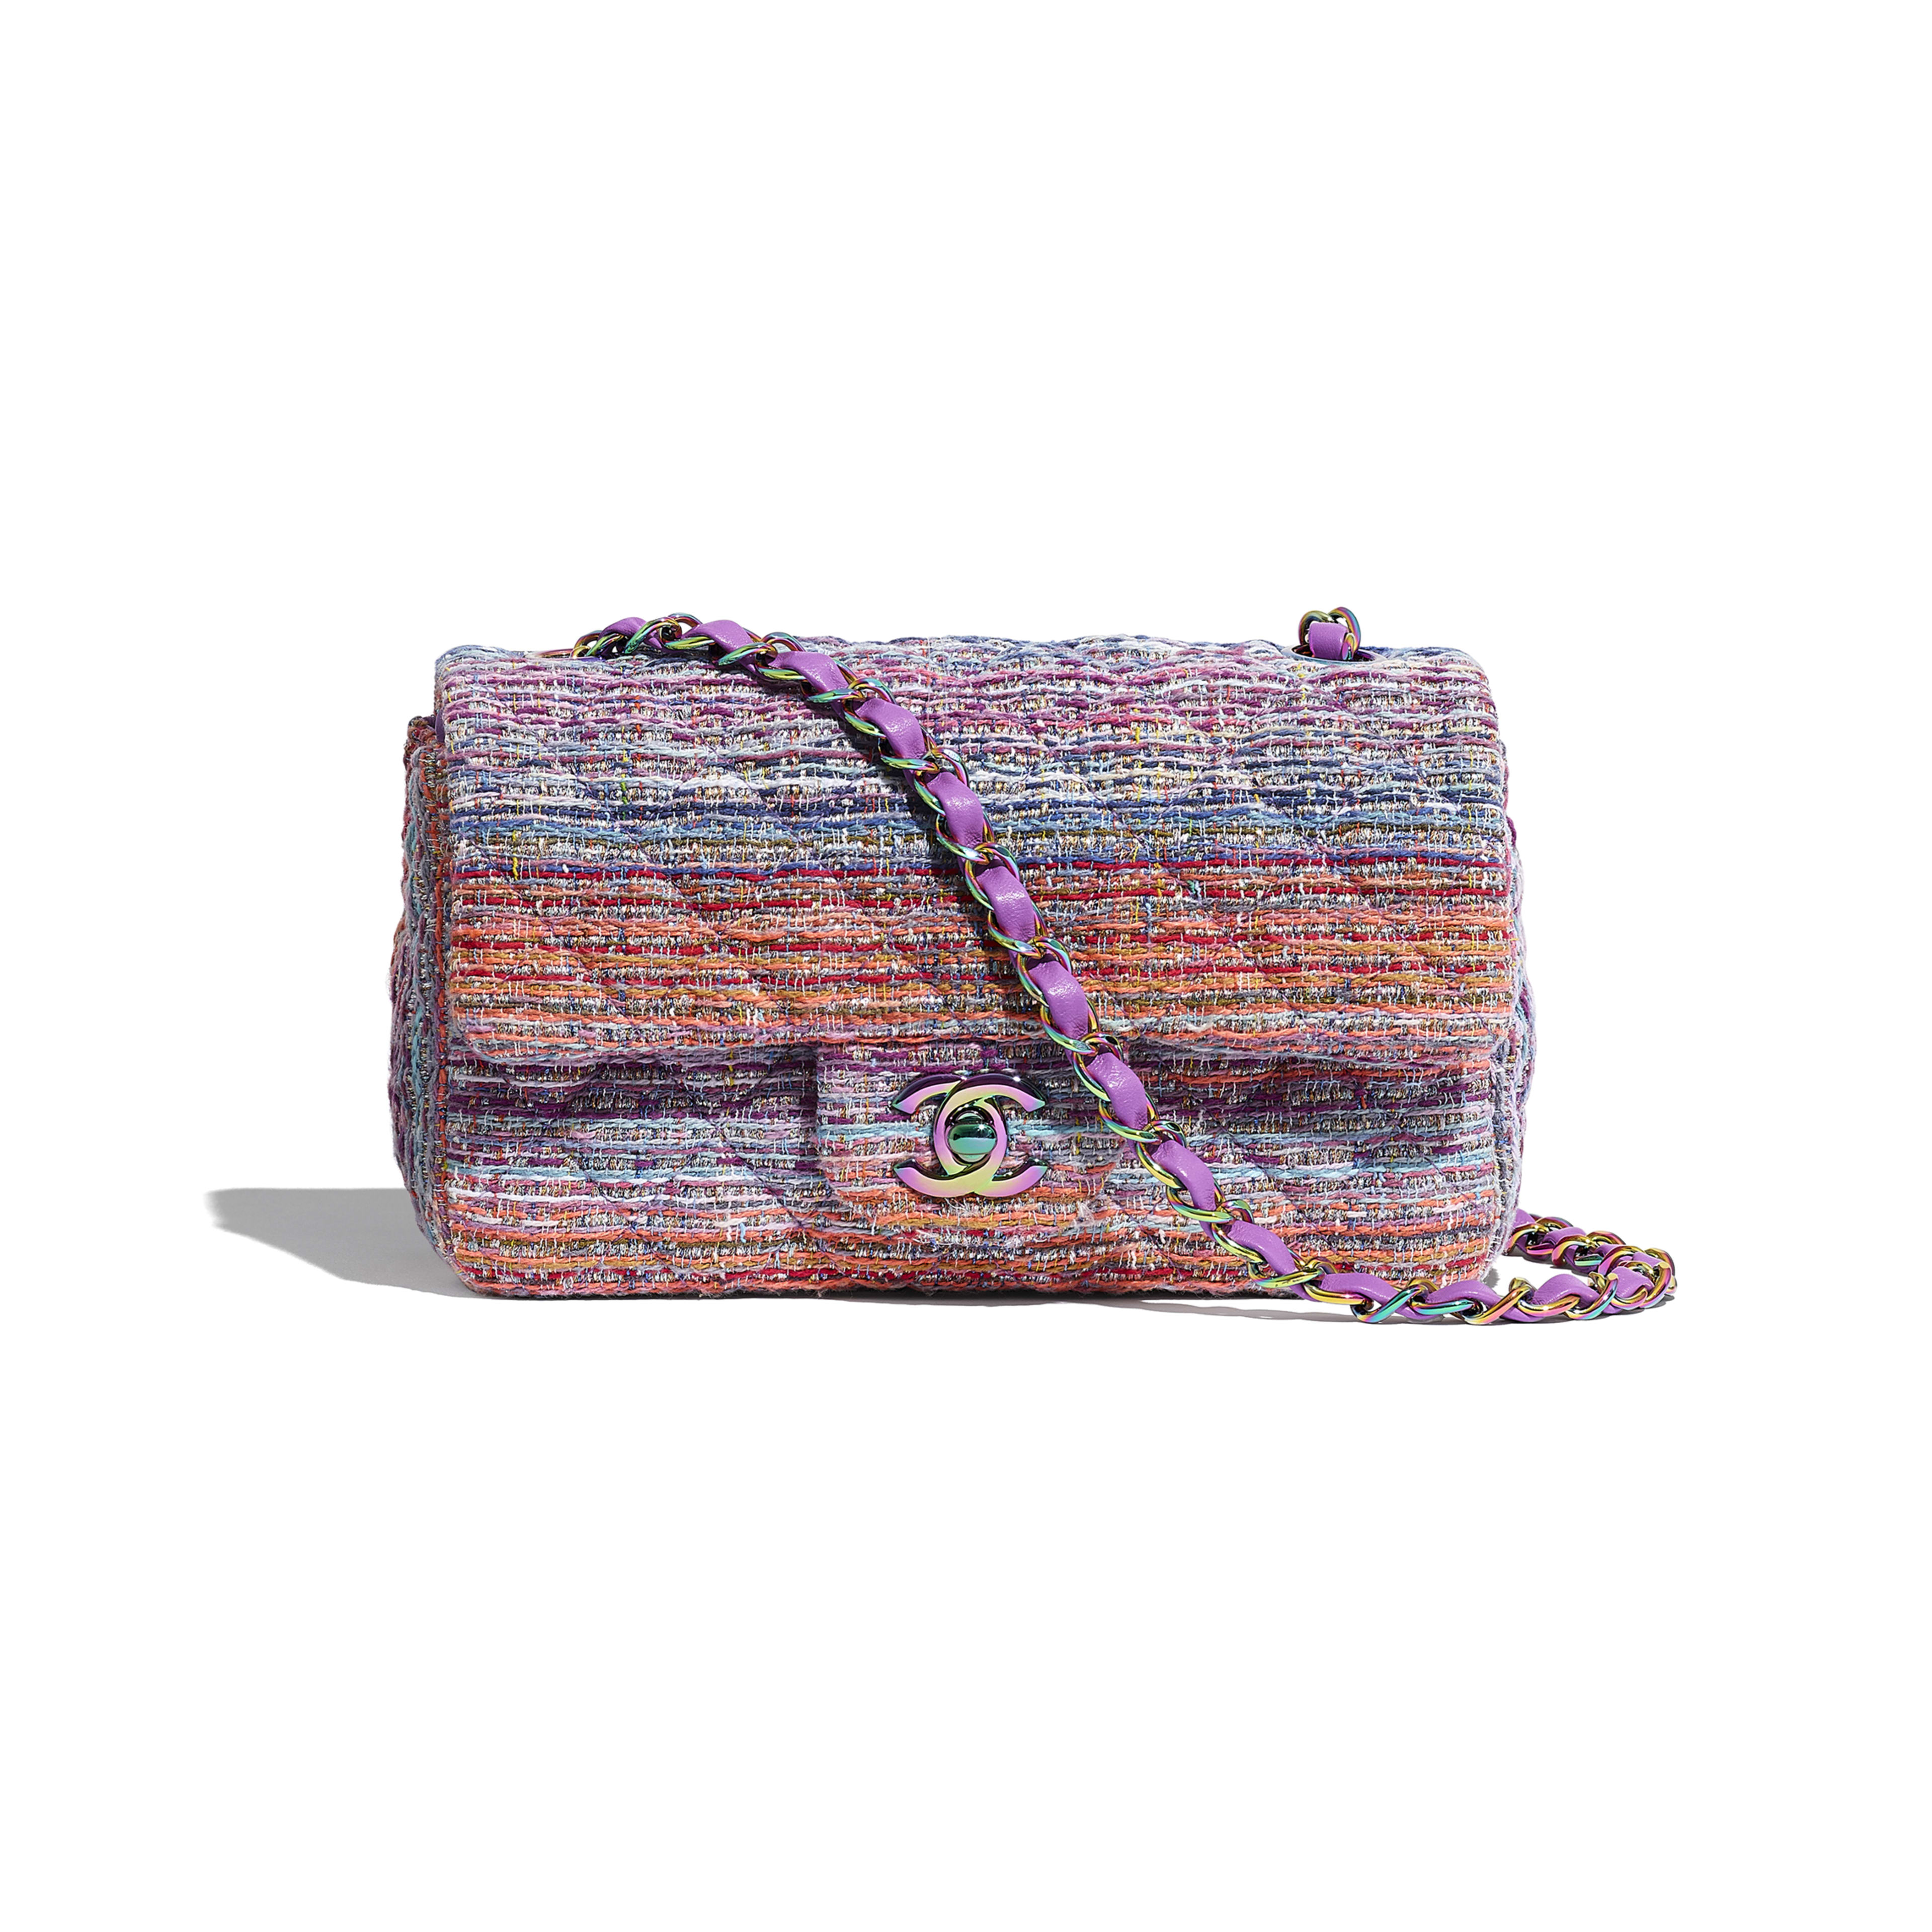 Mini Flap Bag - Multicolor - Tweed & Rainbow Metal - Default view - see full sized version